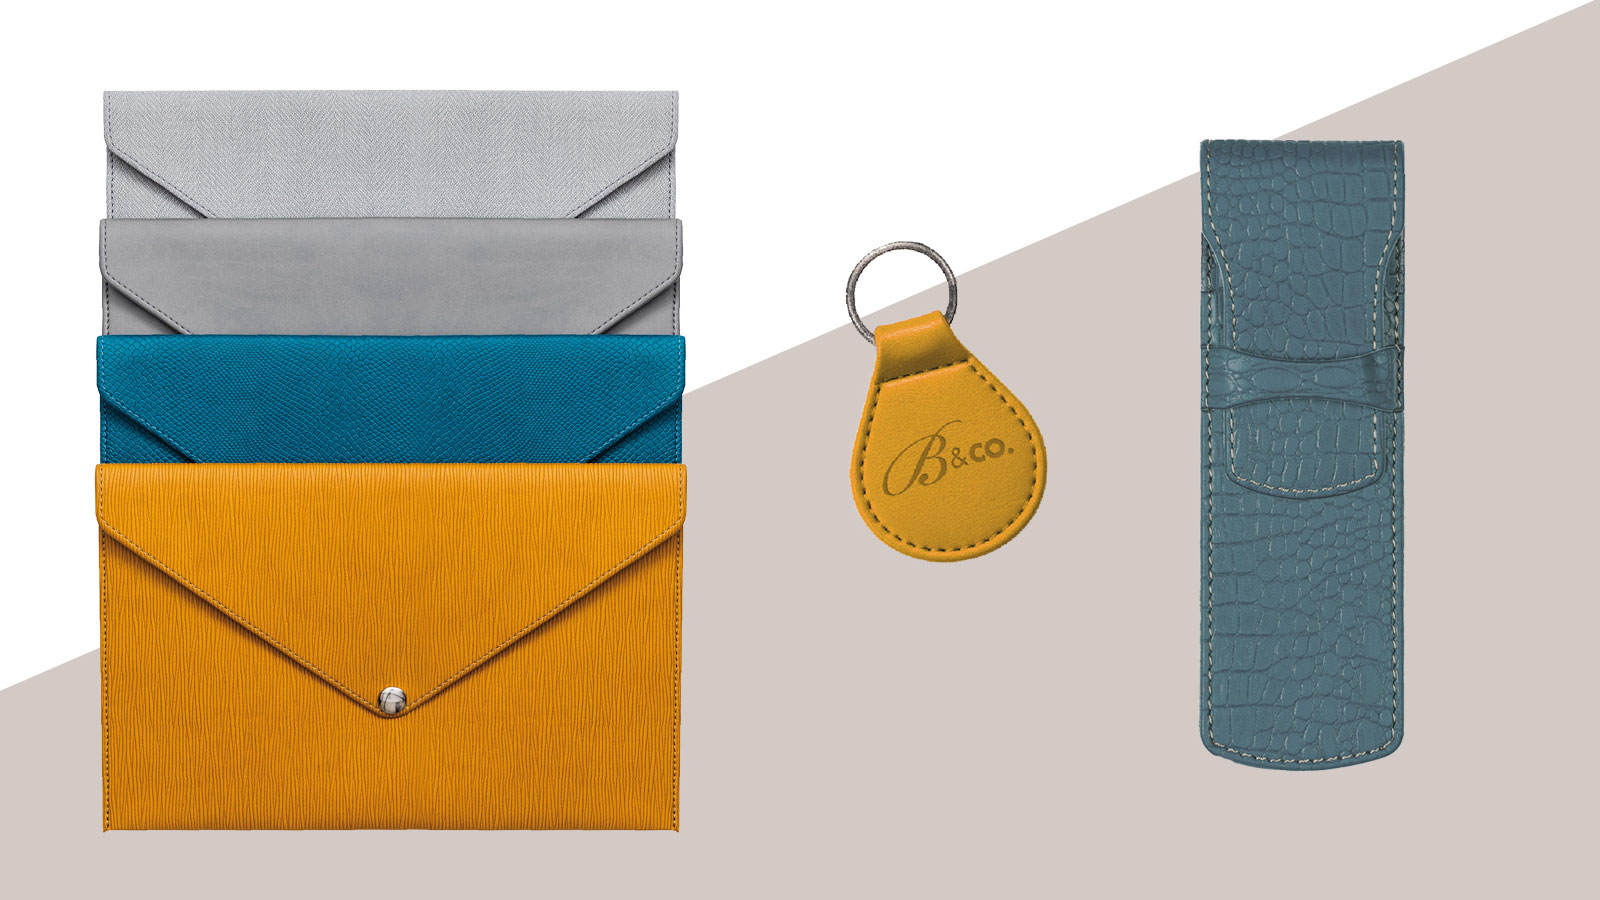 Fabrication Ateliers Bag De D'agendasFabricant Et Tote Y76fgyvb